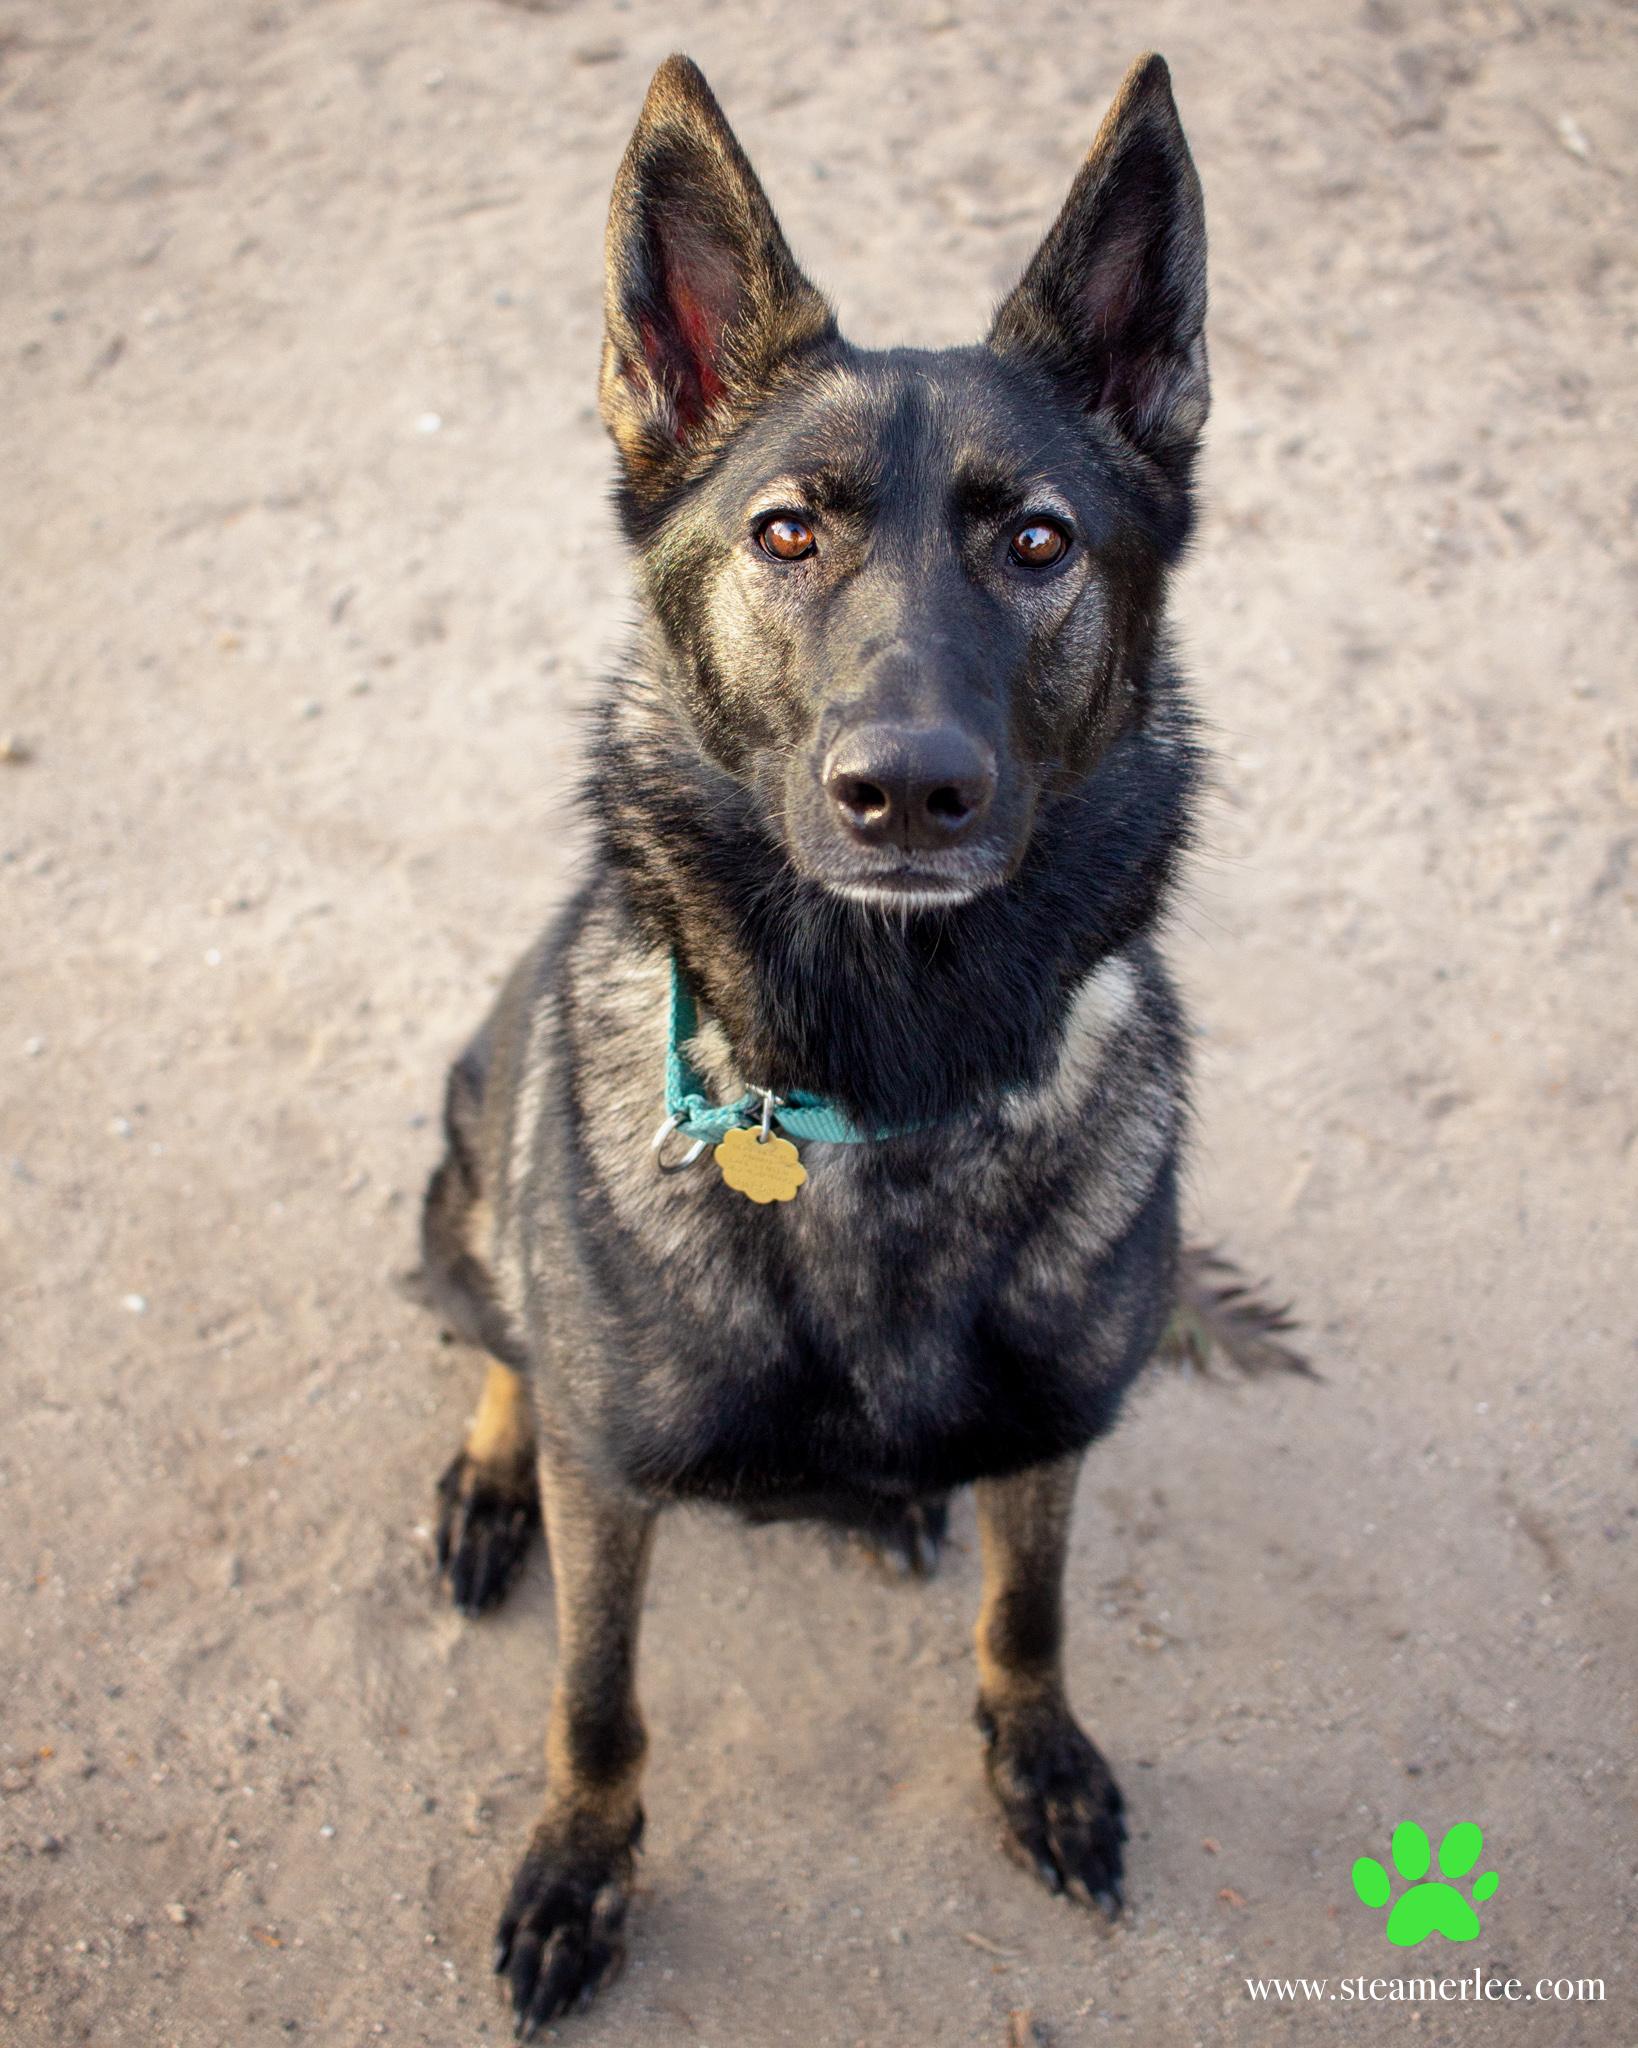 324-Orange-County-Dog-Photography-Steamer-Lee-Southern-California-SBACC.JPG